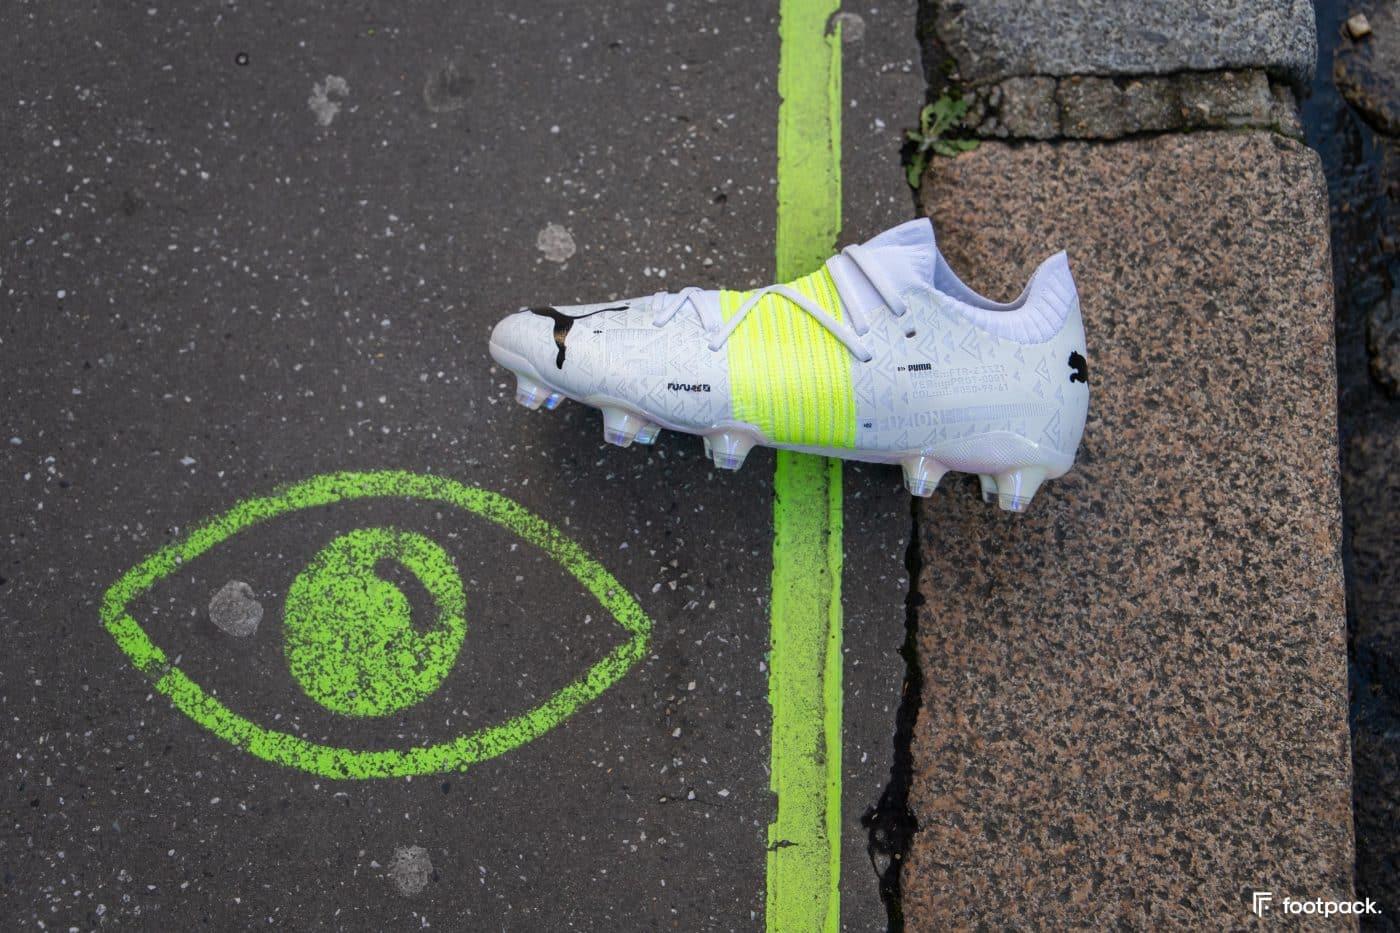 puma-future-z-teaser-edition-shooting-footpack-5